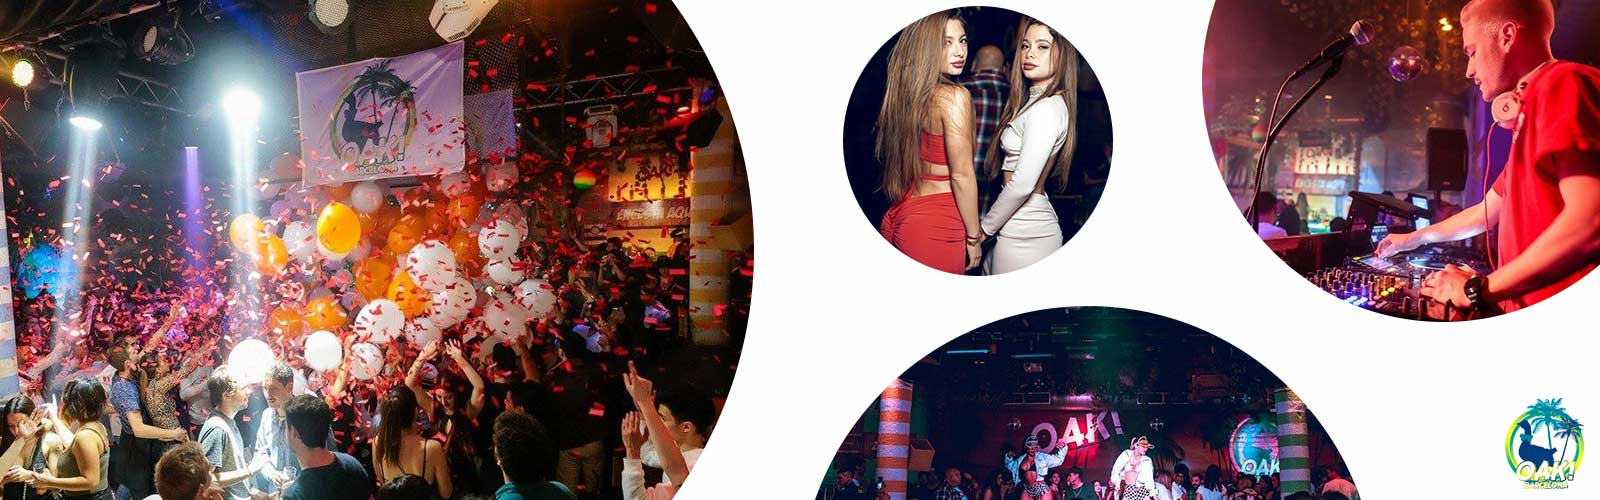 Club Oak Discoteca Barcelona